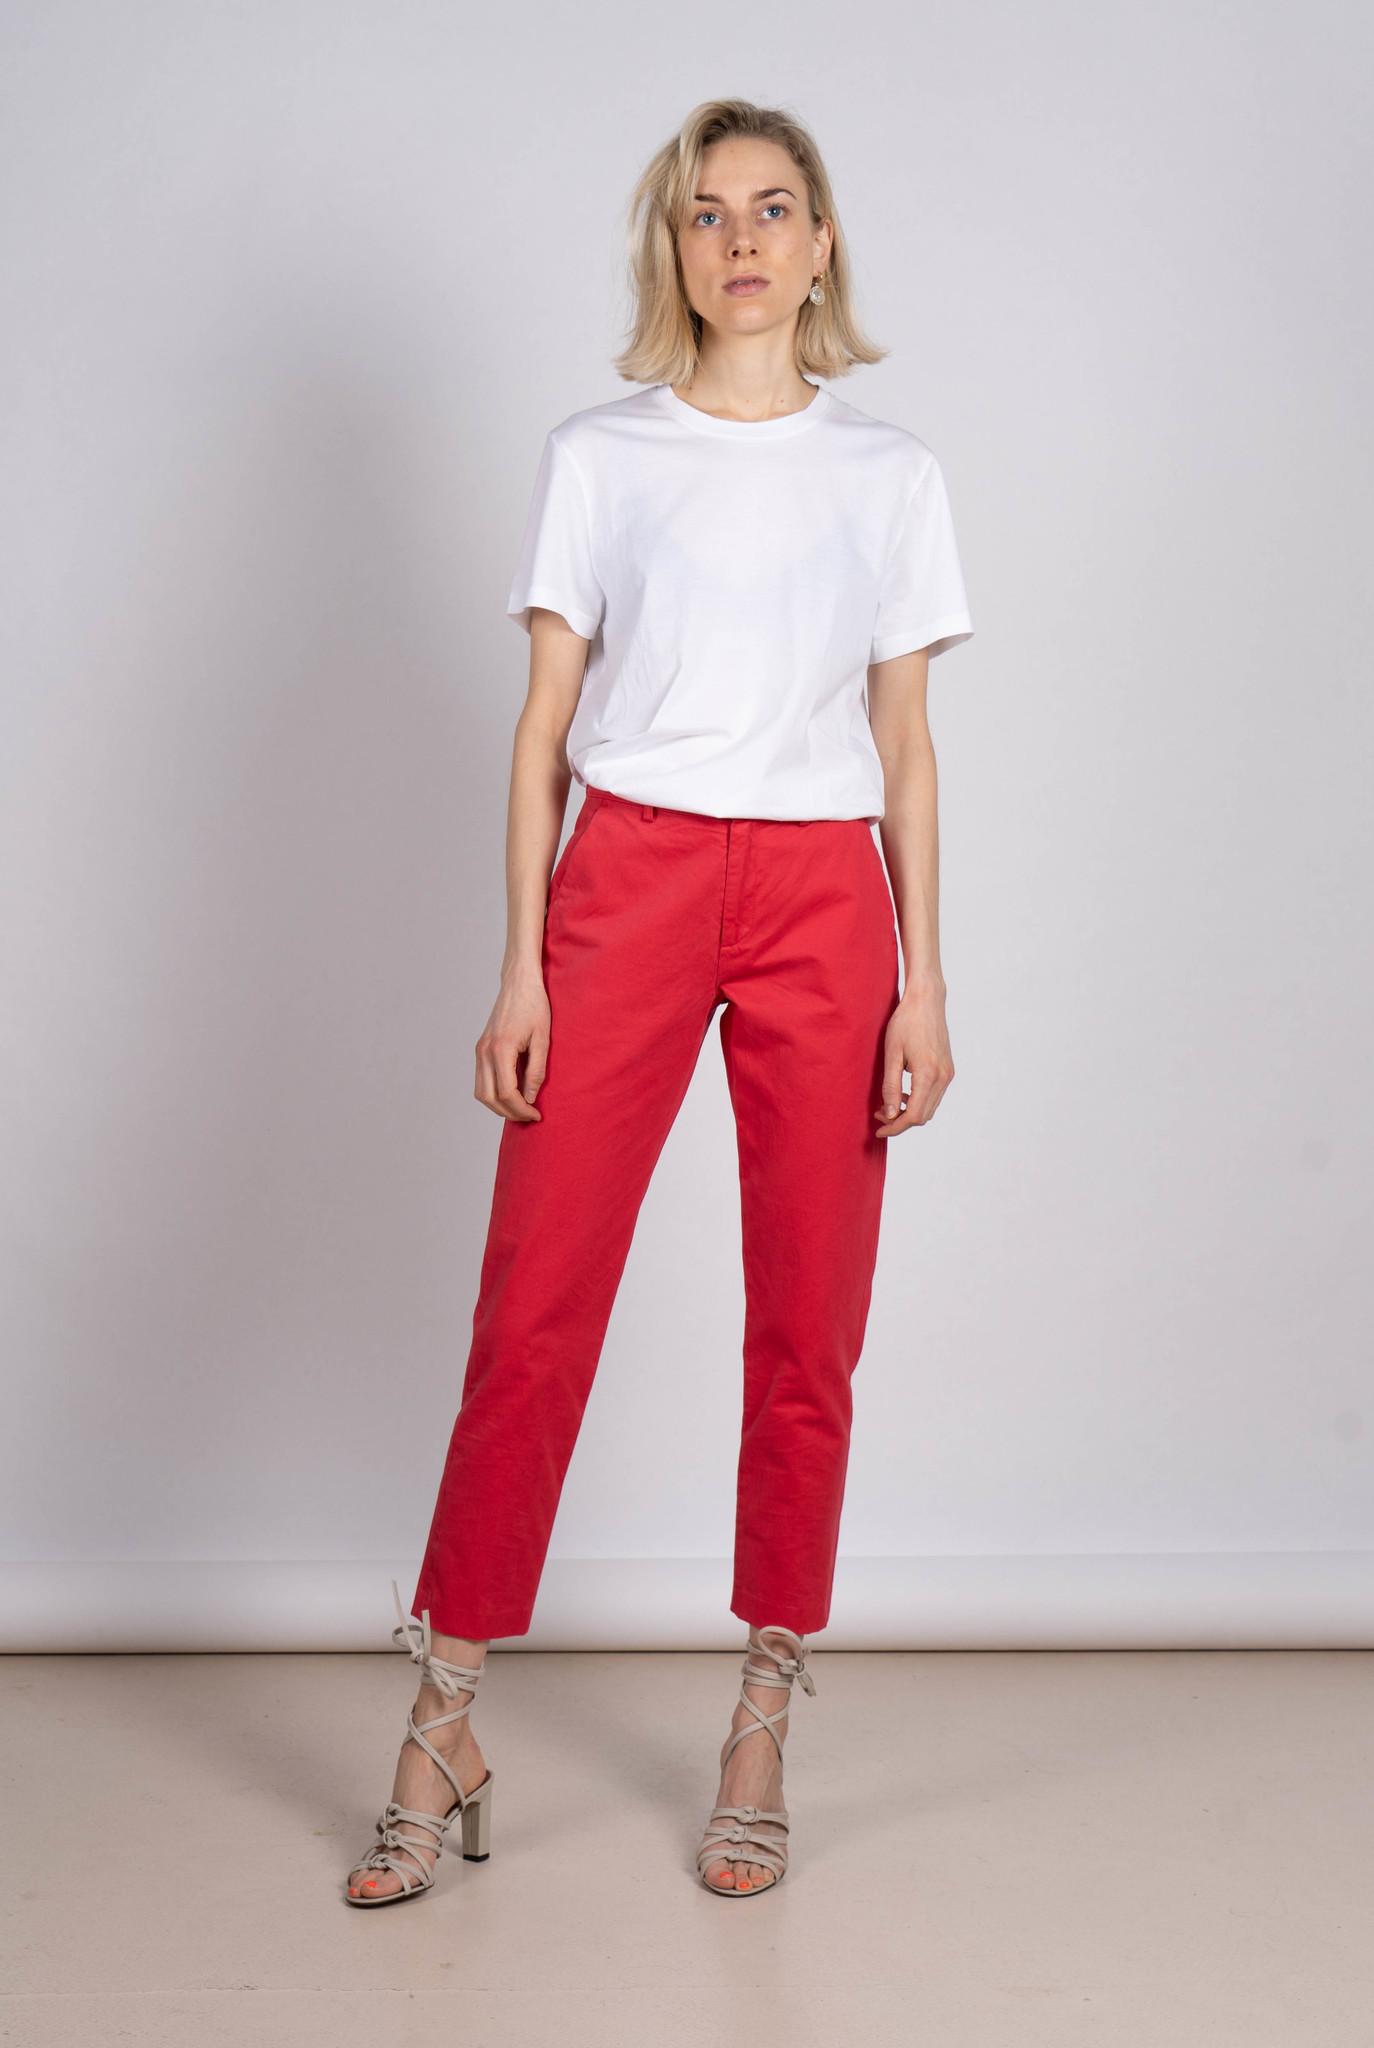 Lou chino pantalon poppy